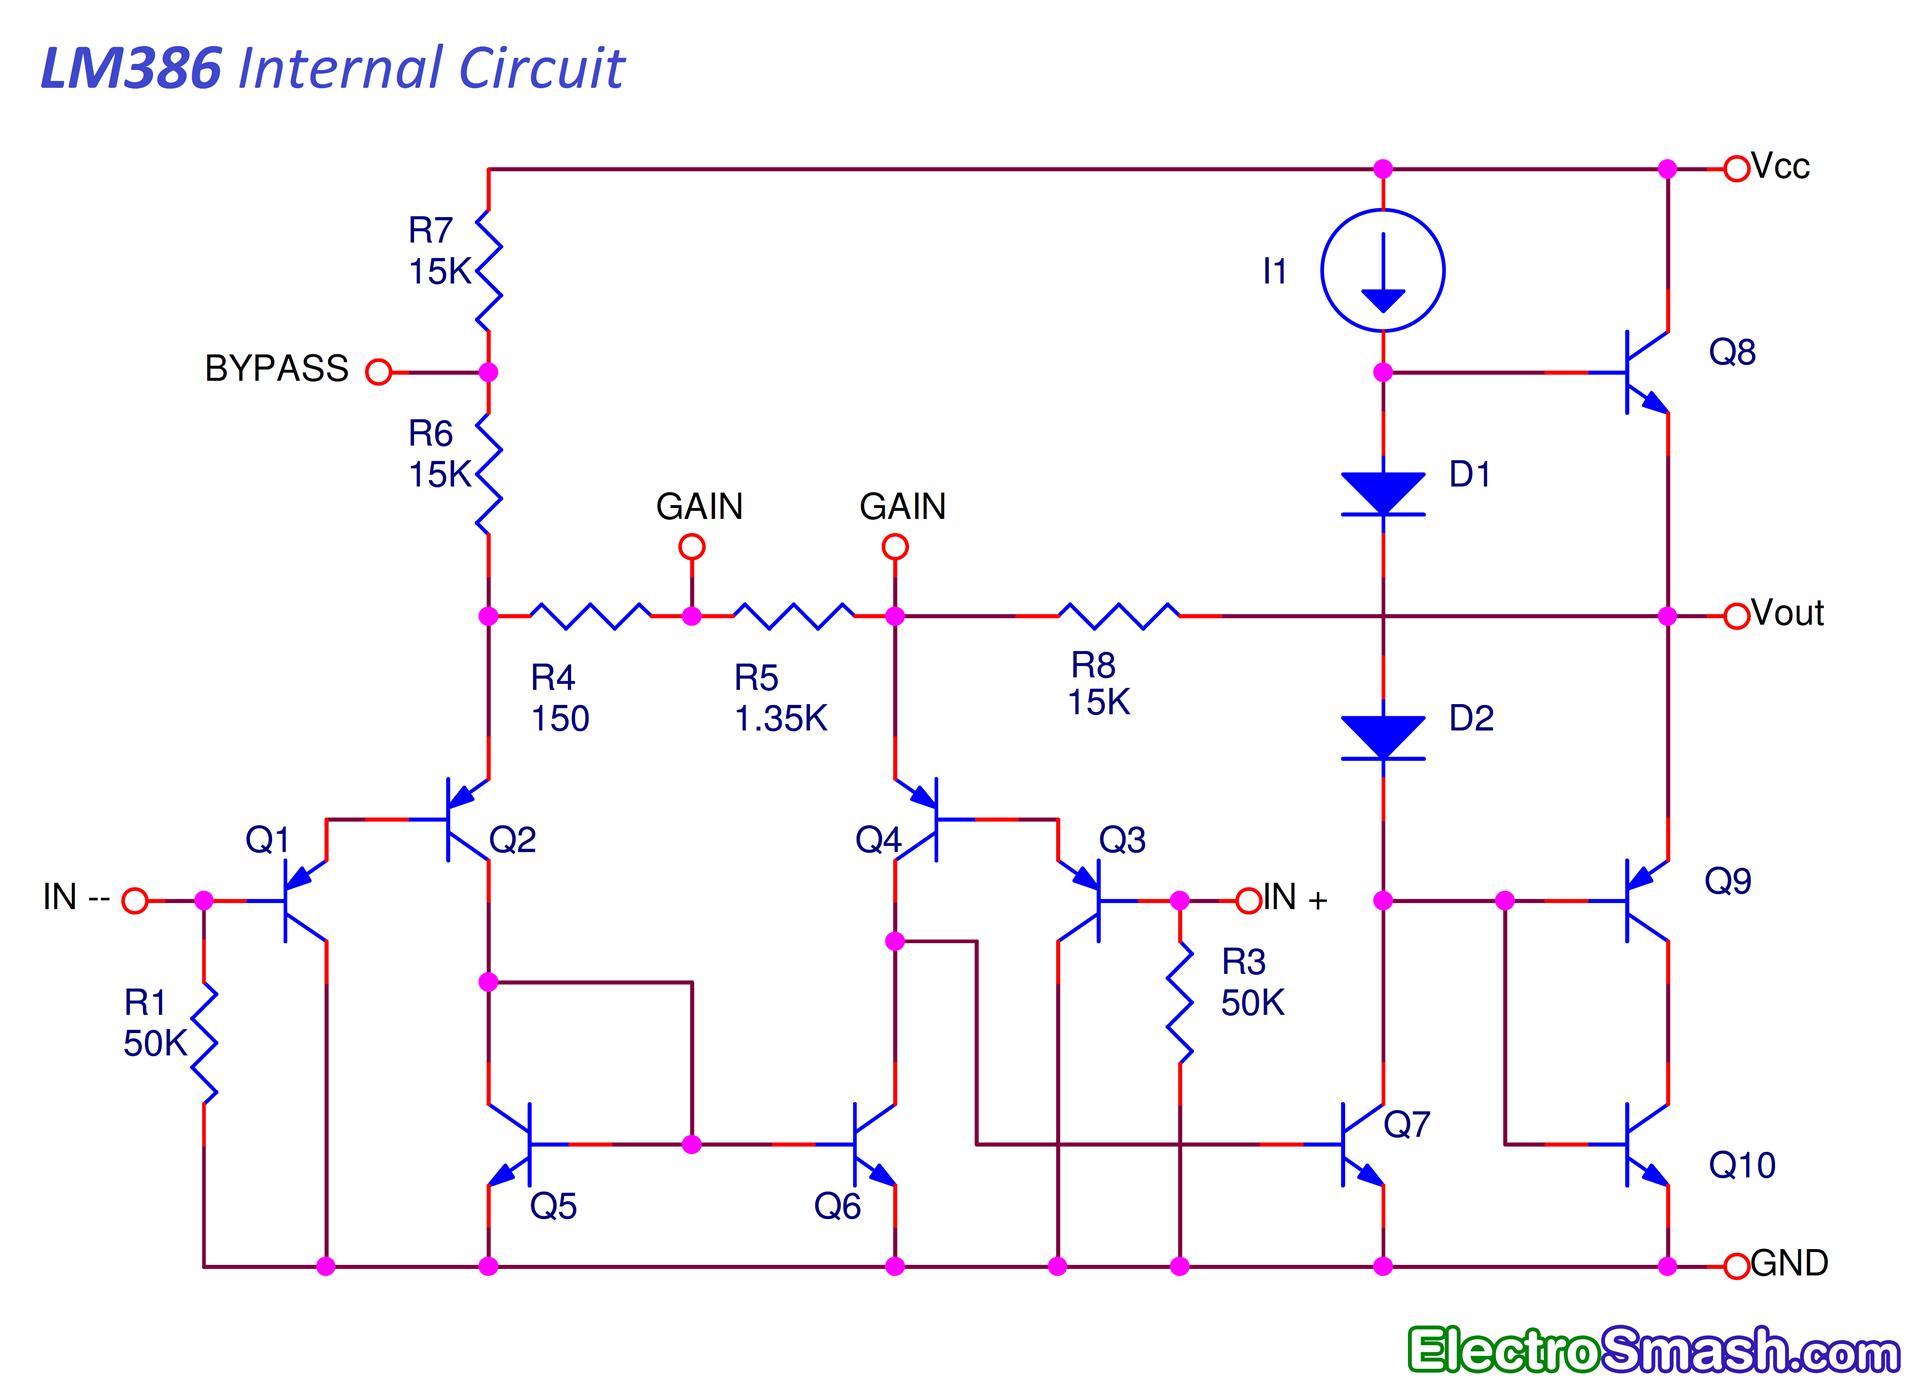 6 ohm speaker wiring diagram  6  free engine image for